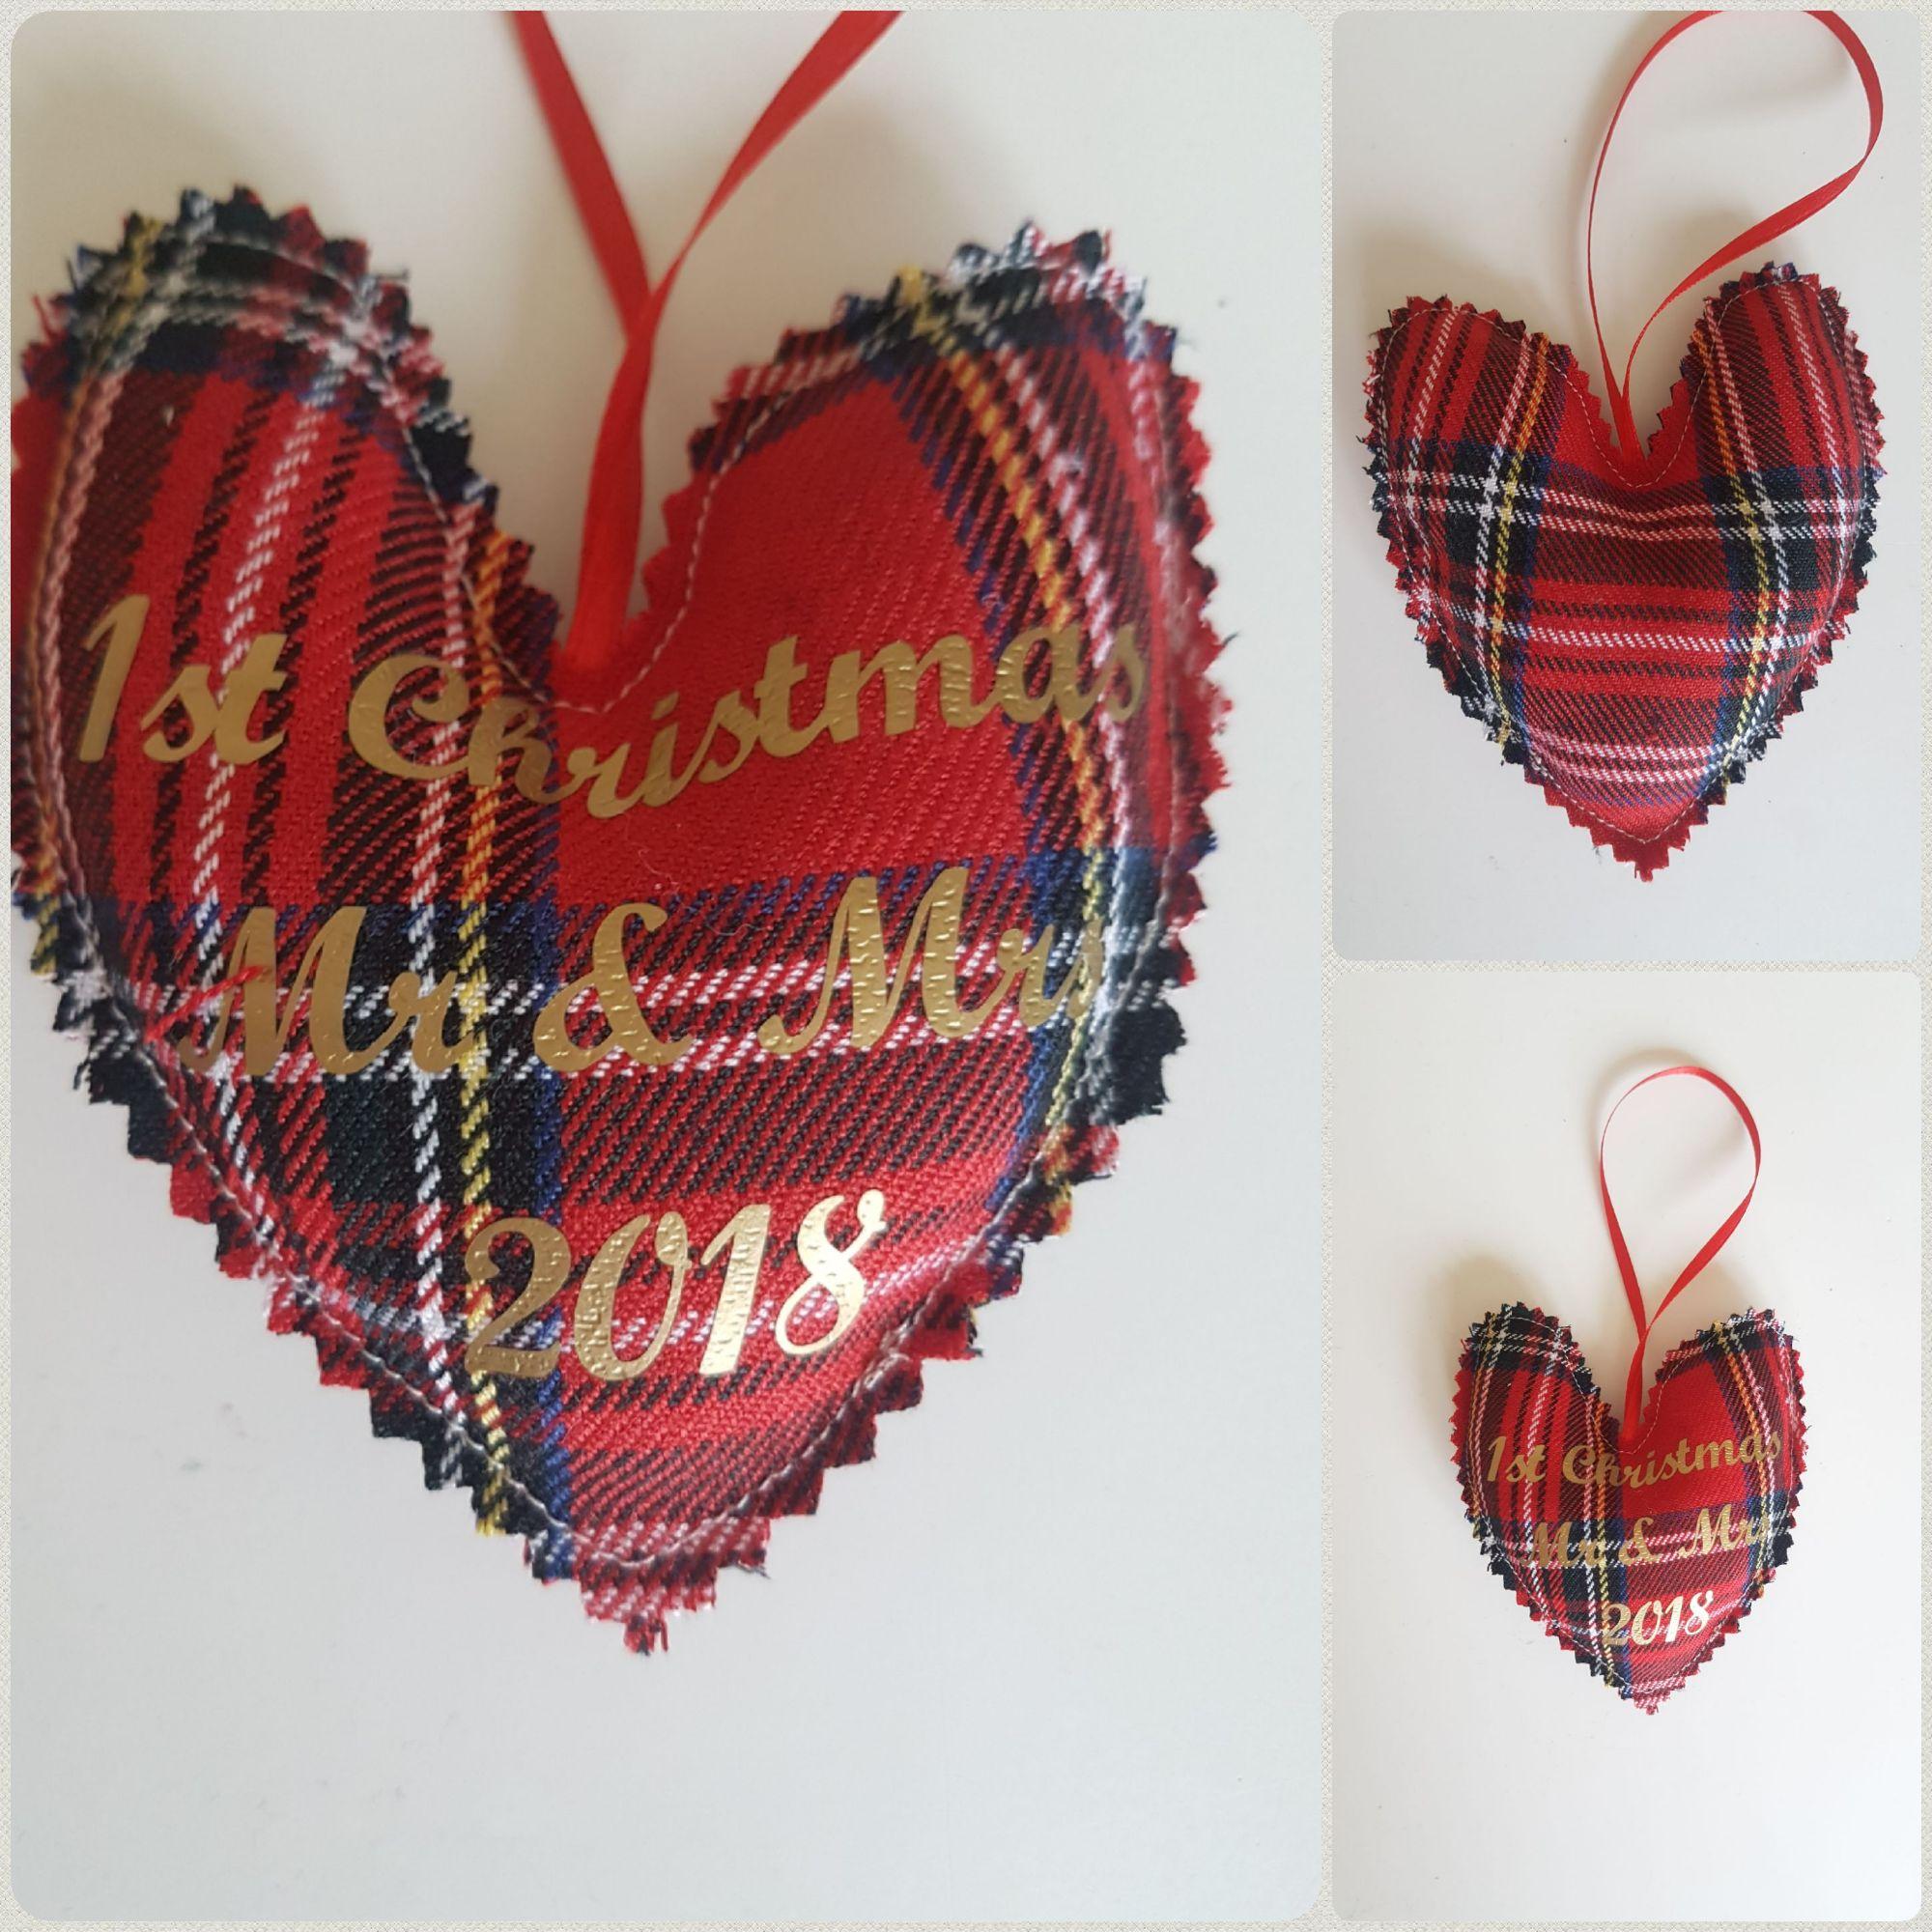 Red tartan 1st christmas as mr & mrs